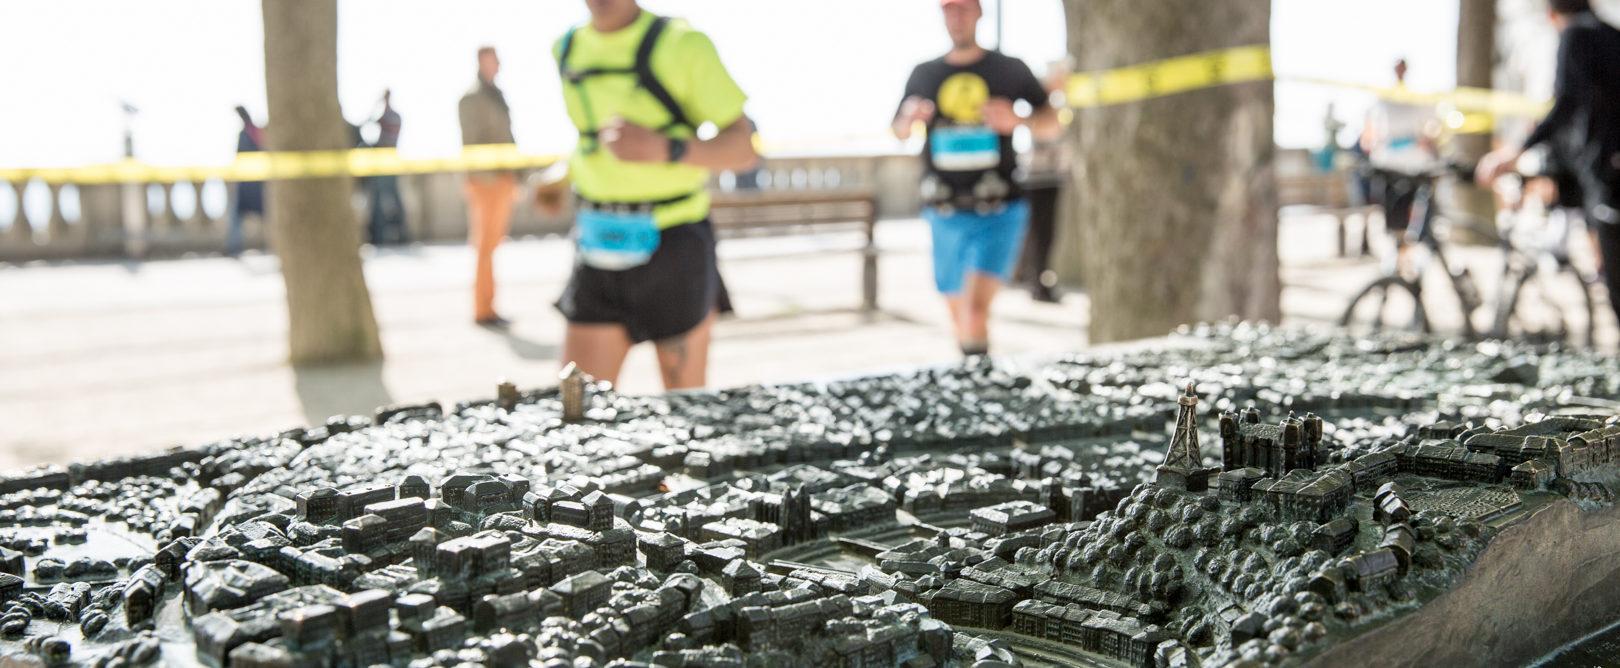 Course à pied - Lyon Urban Trail – Trail Urbain – LUT - © Gilles Reboisson